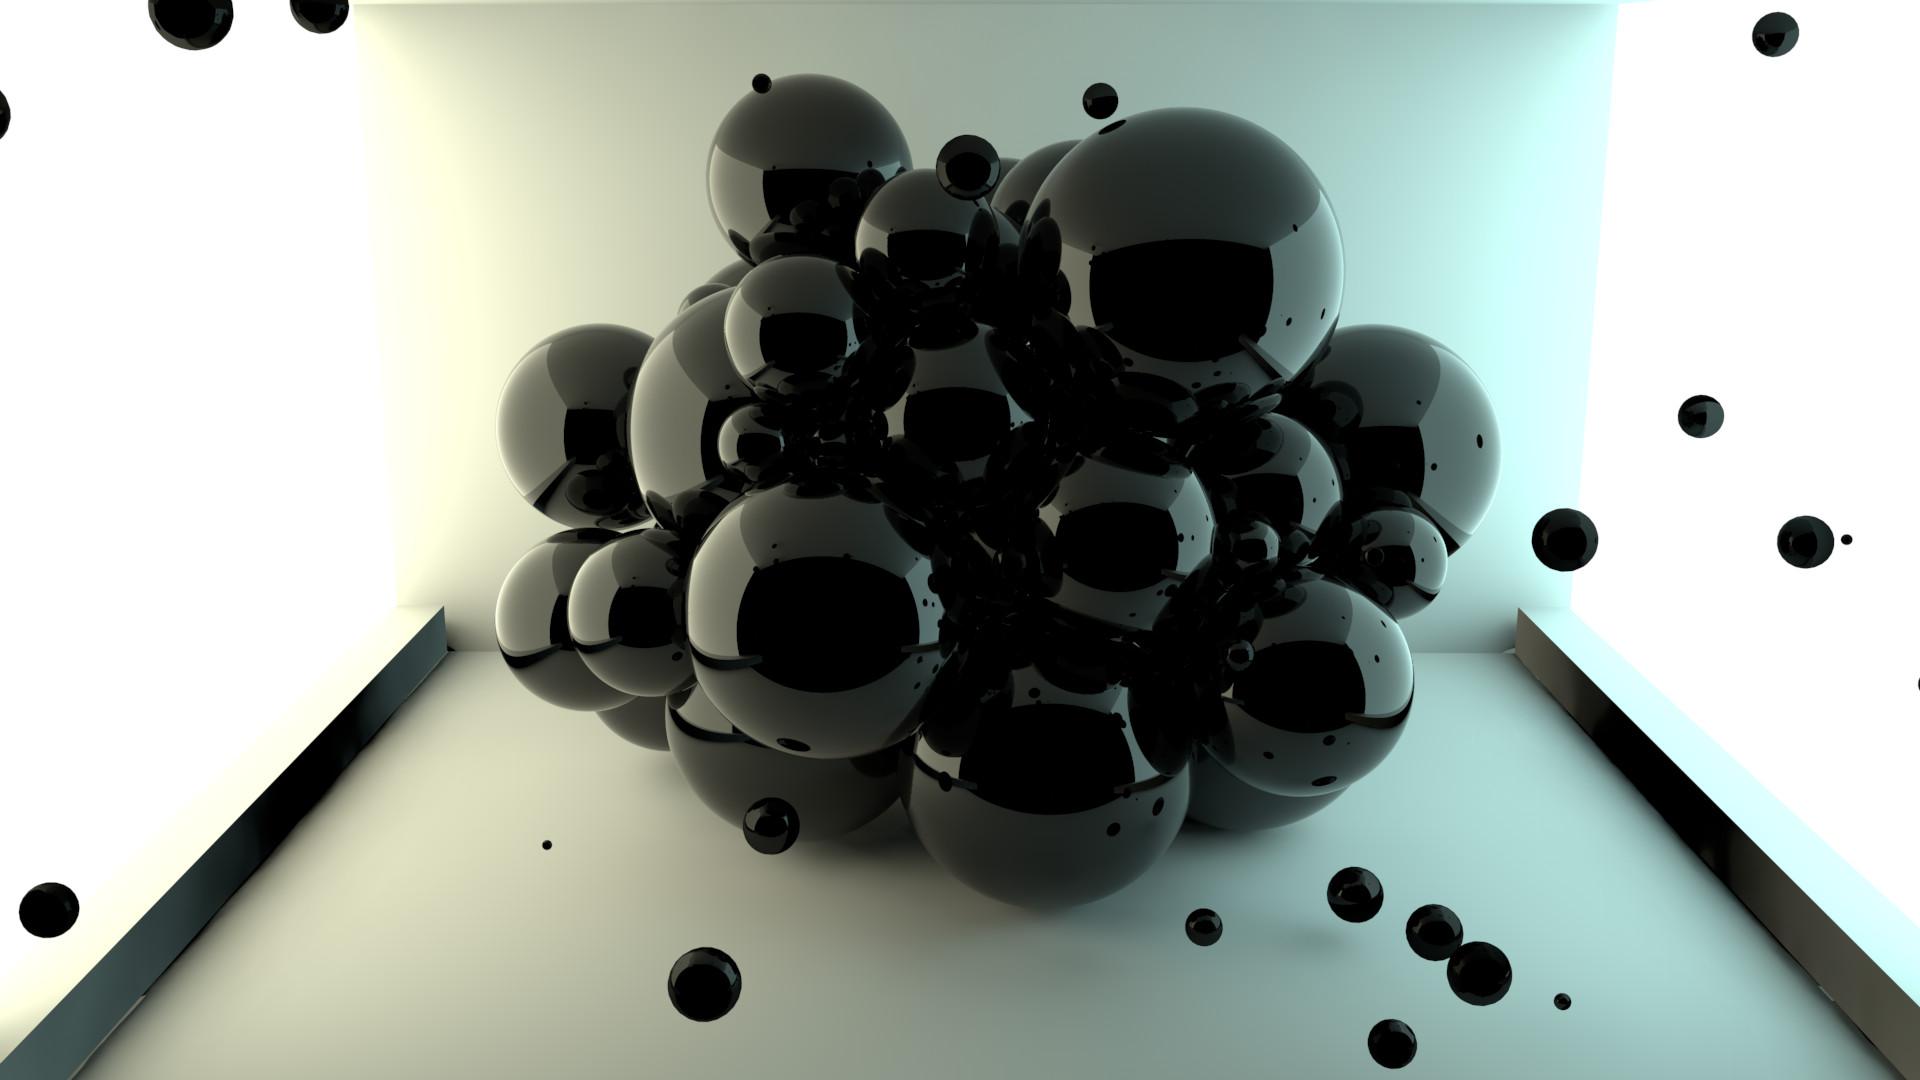 Cinema 4D -- Abstract Spheres by SMOKEYoriginalHD